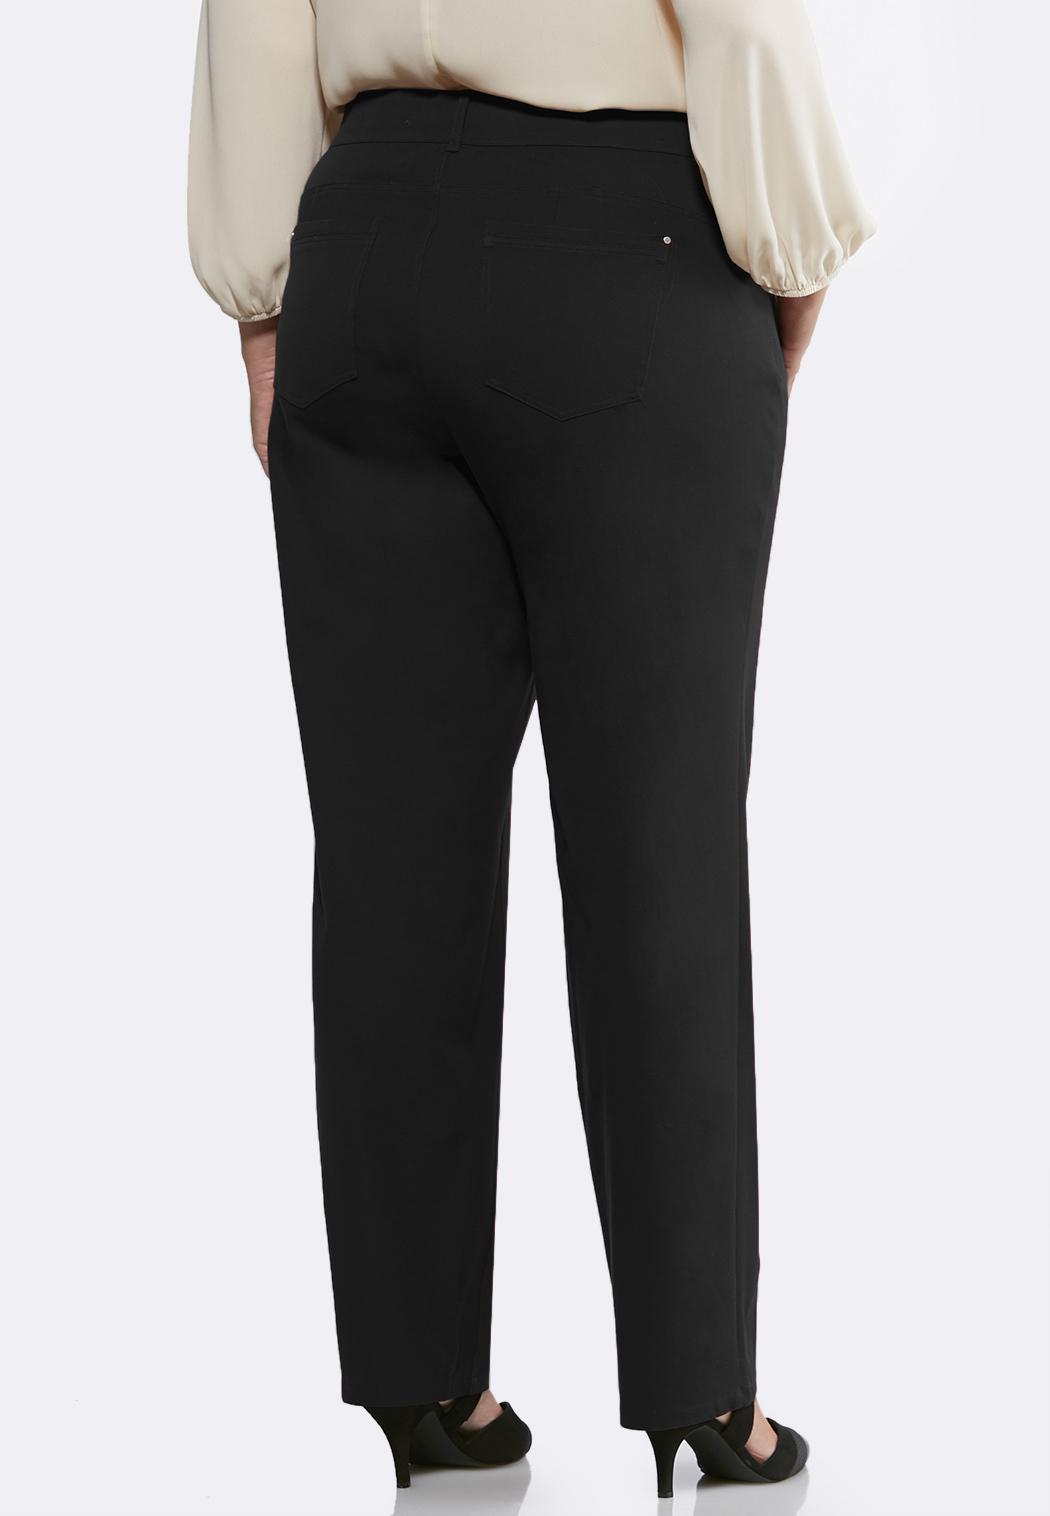 Plus Extended Curvy Everywhere Pants (Item #43956375)